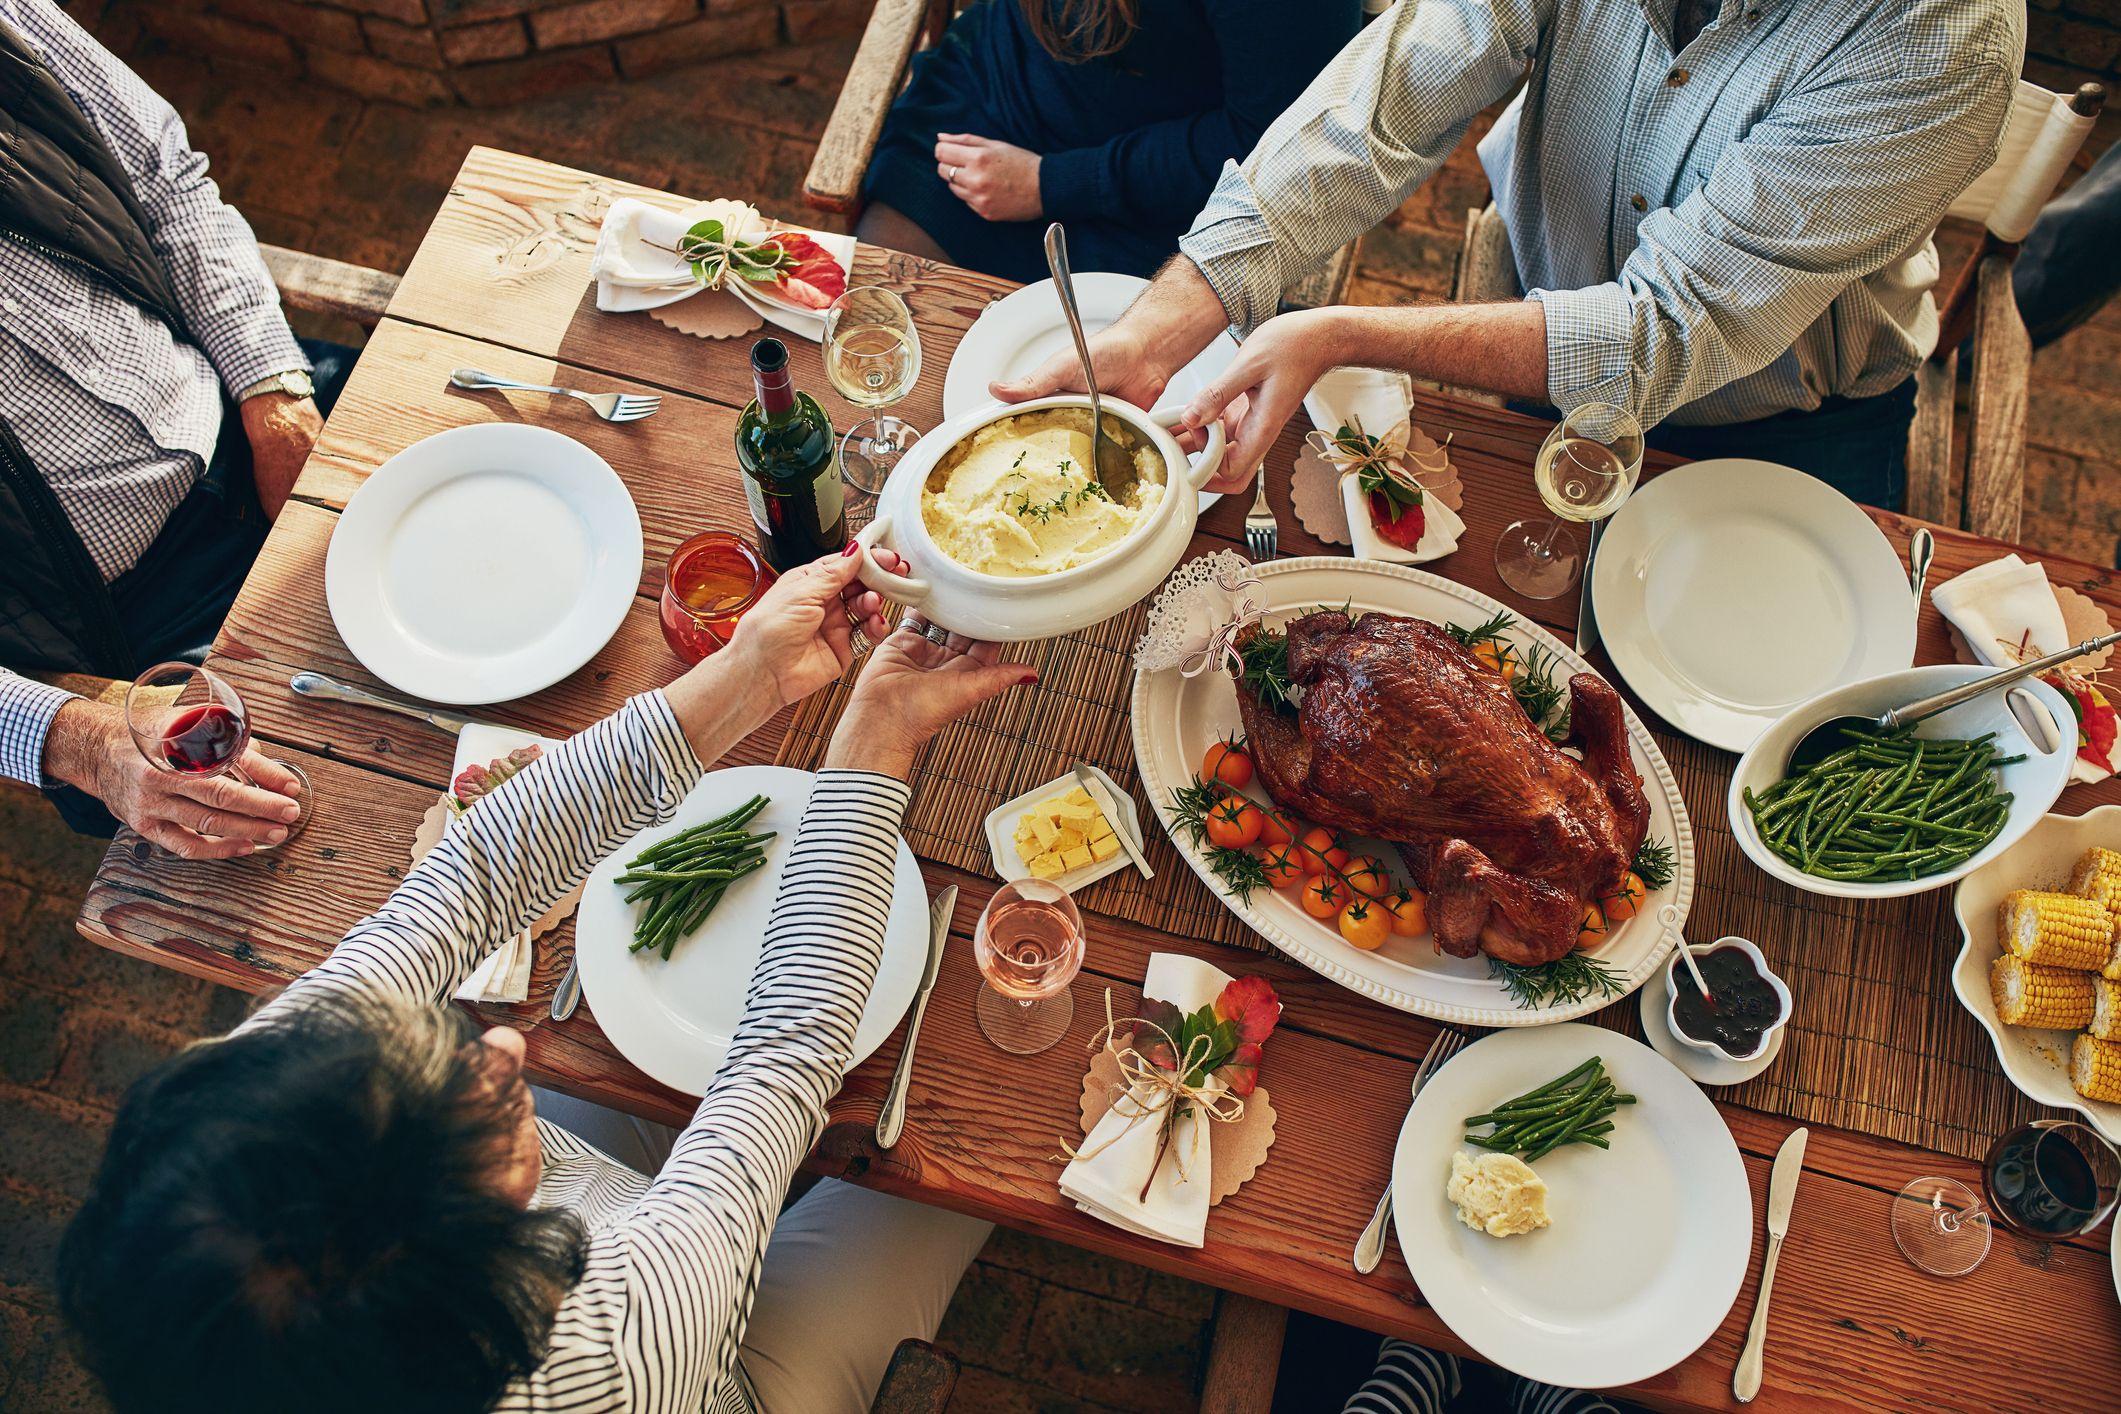 Watch Thanksgiving Dinner: 5 Easy Ways to SaveCalories video